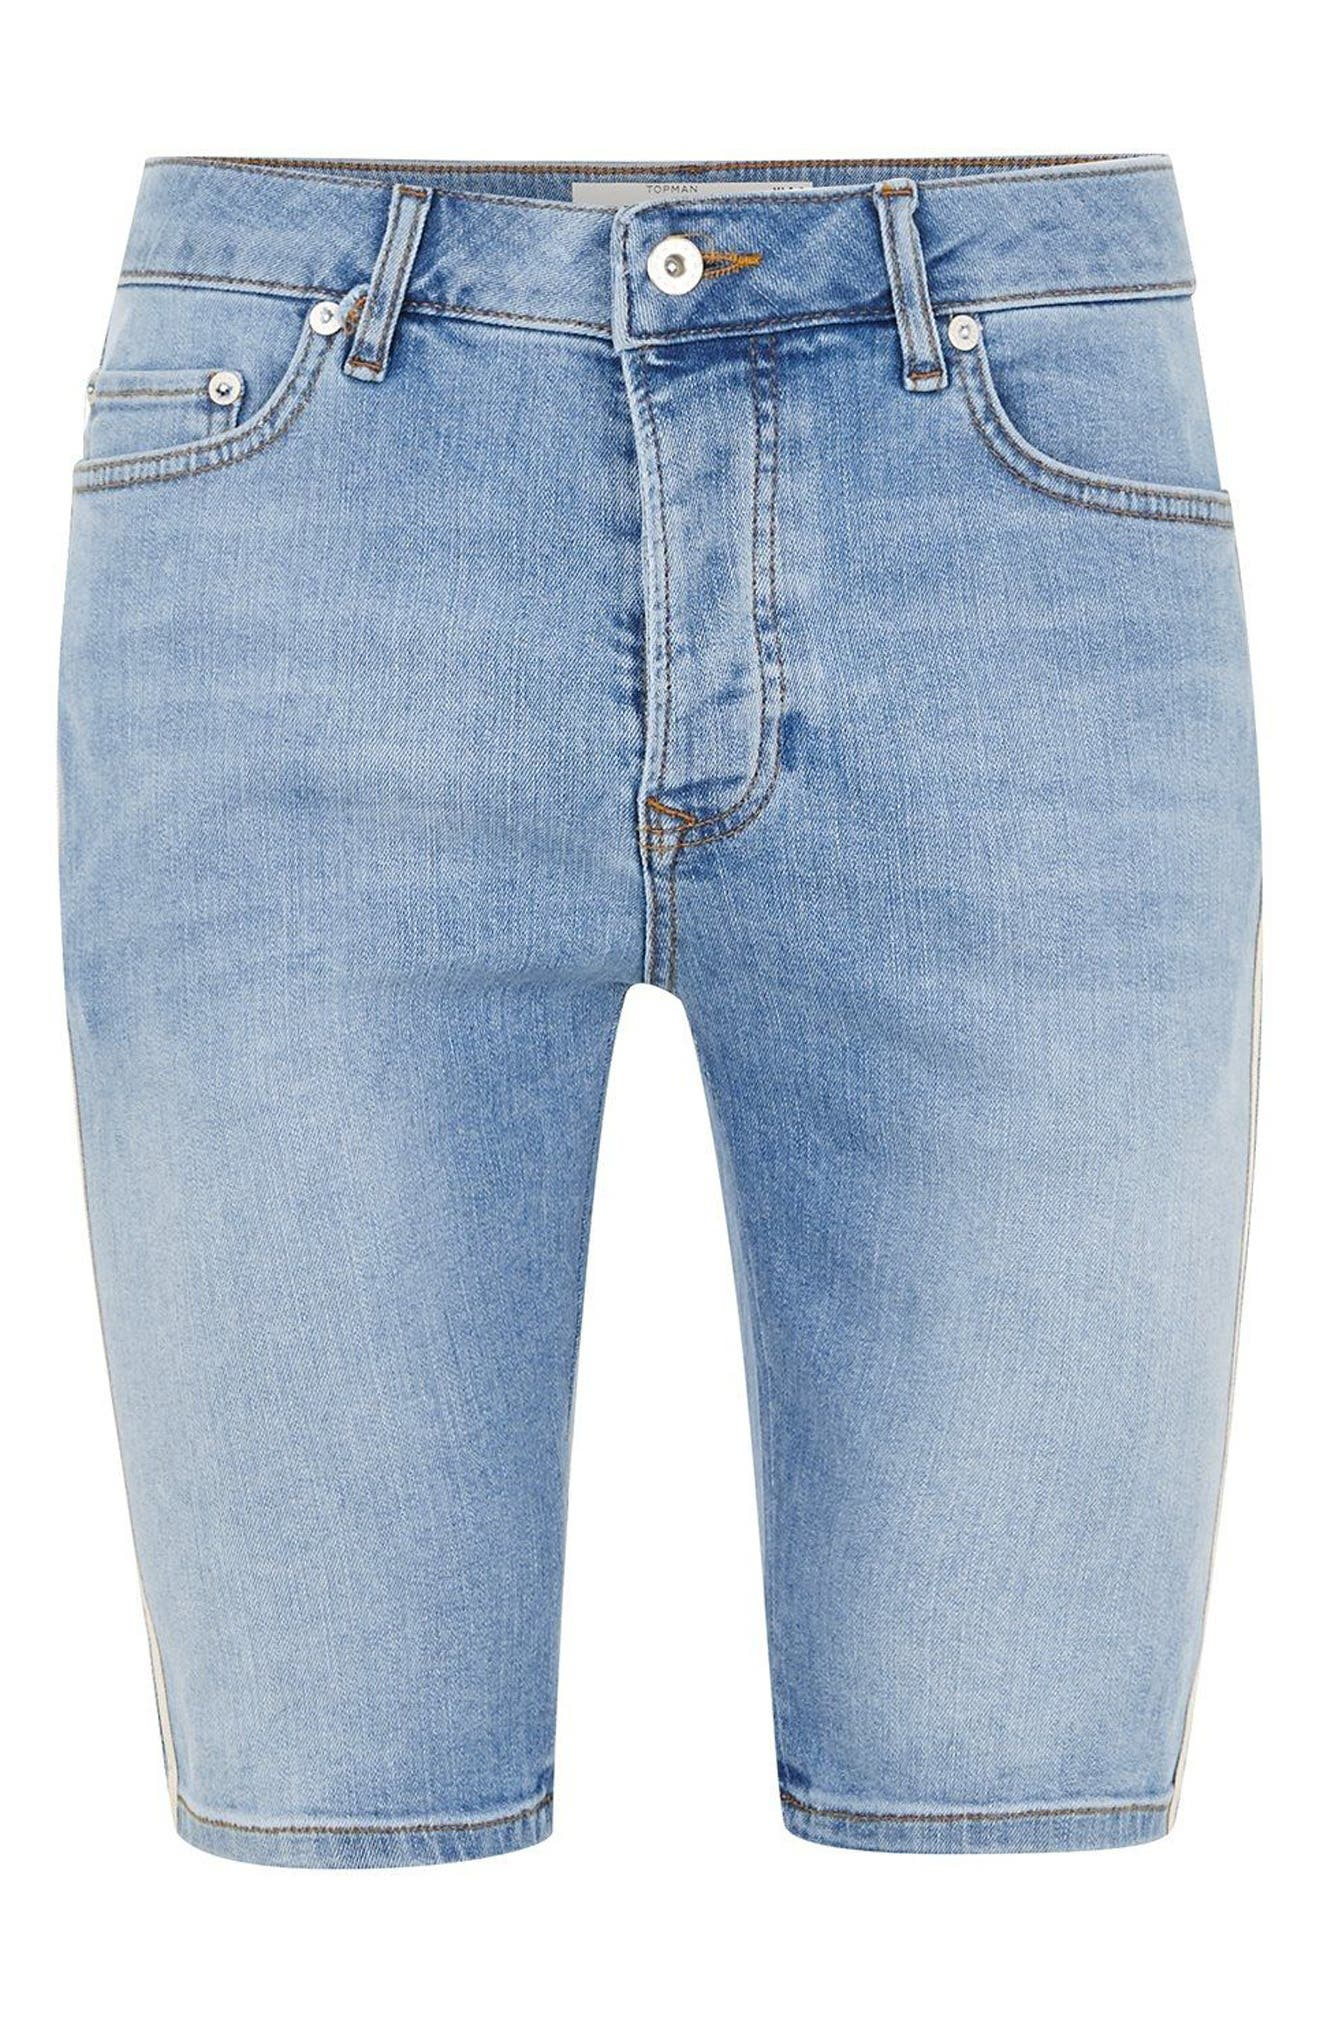 Tape Stretch Skinny Fit Denim Shorts,                             Alternate thumbnail 3, color,                             400